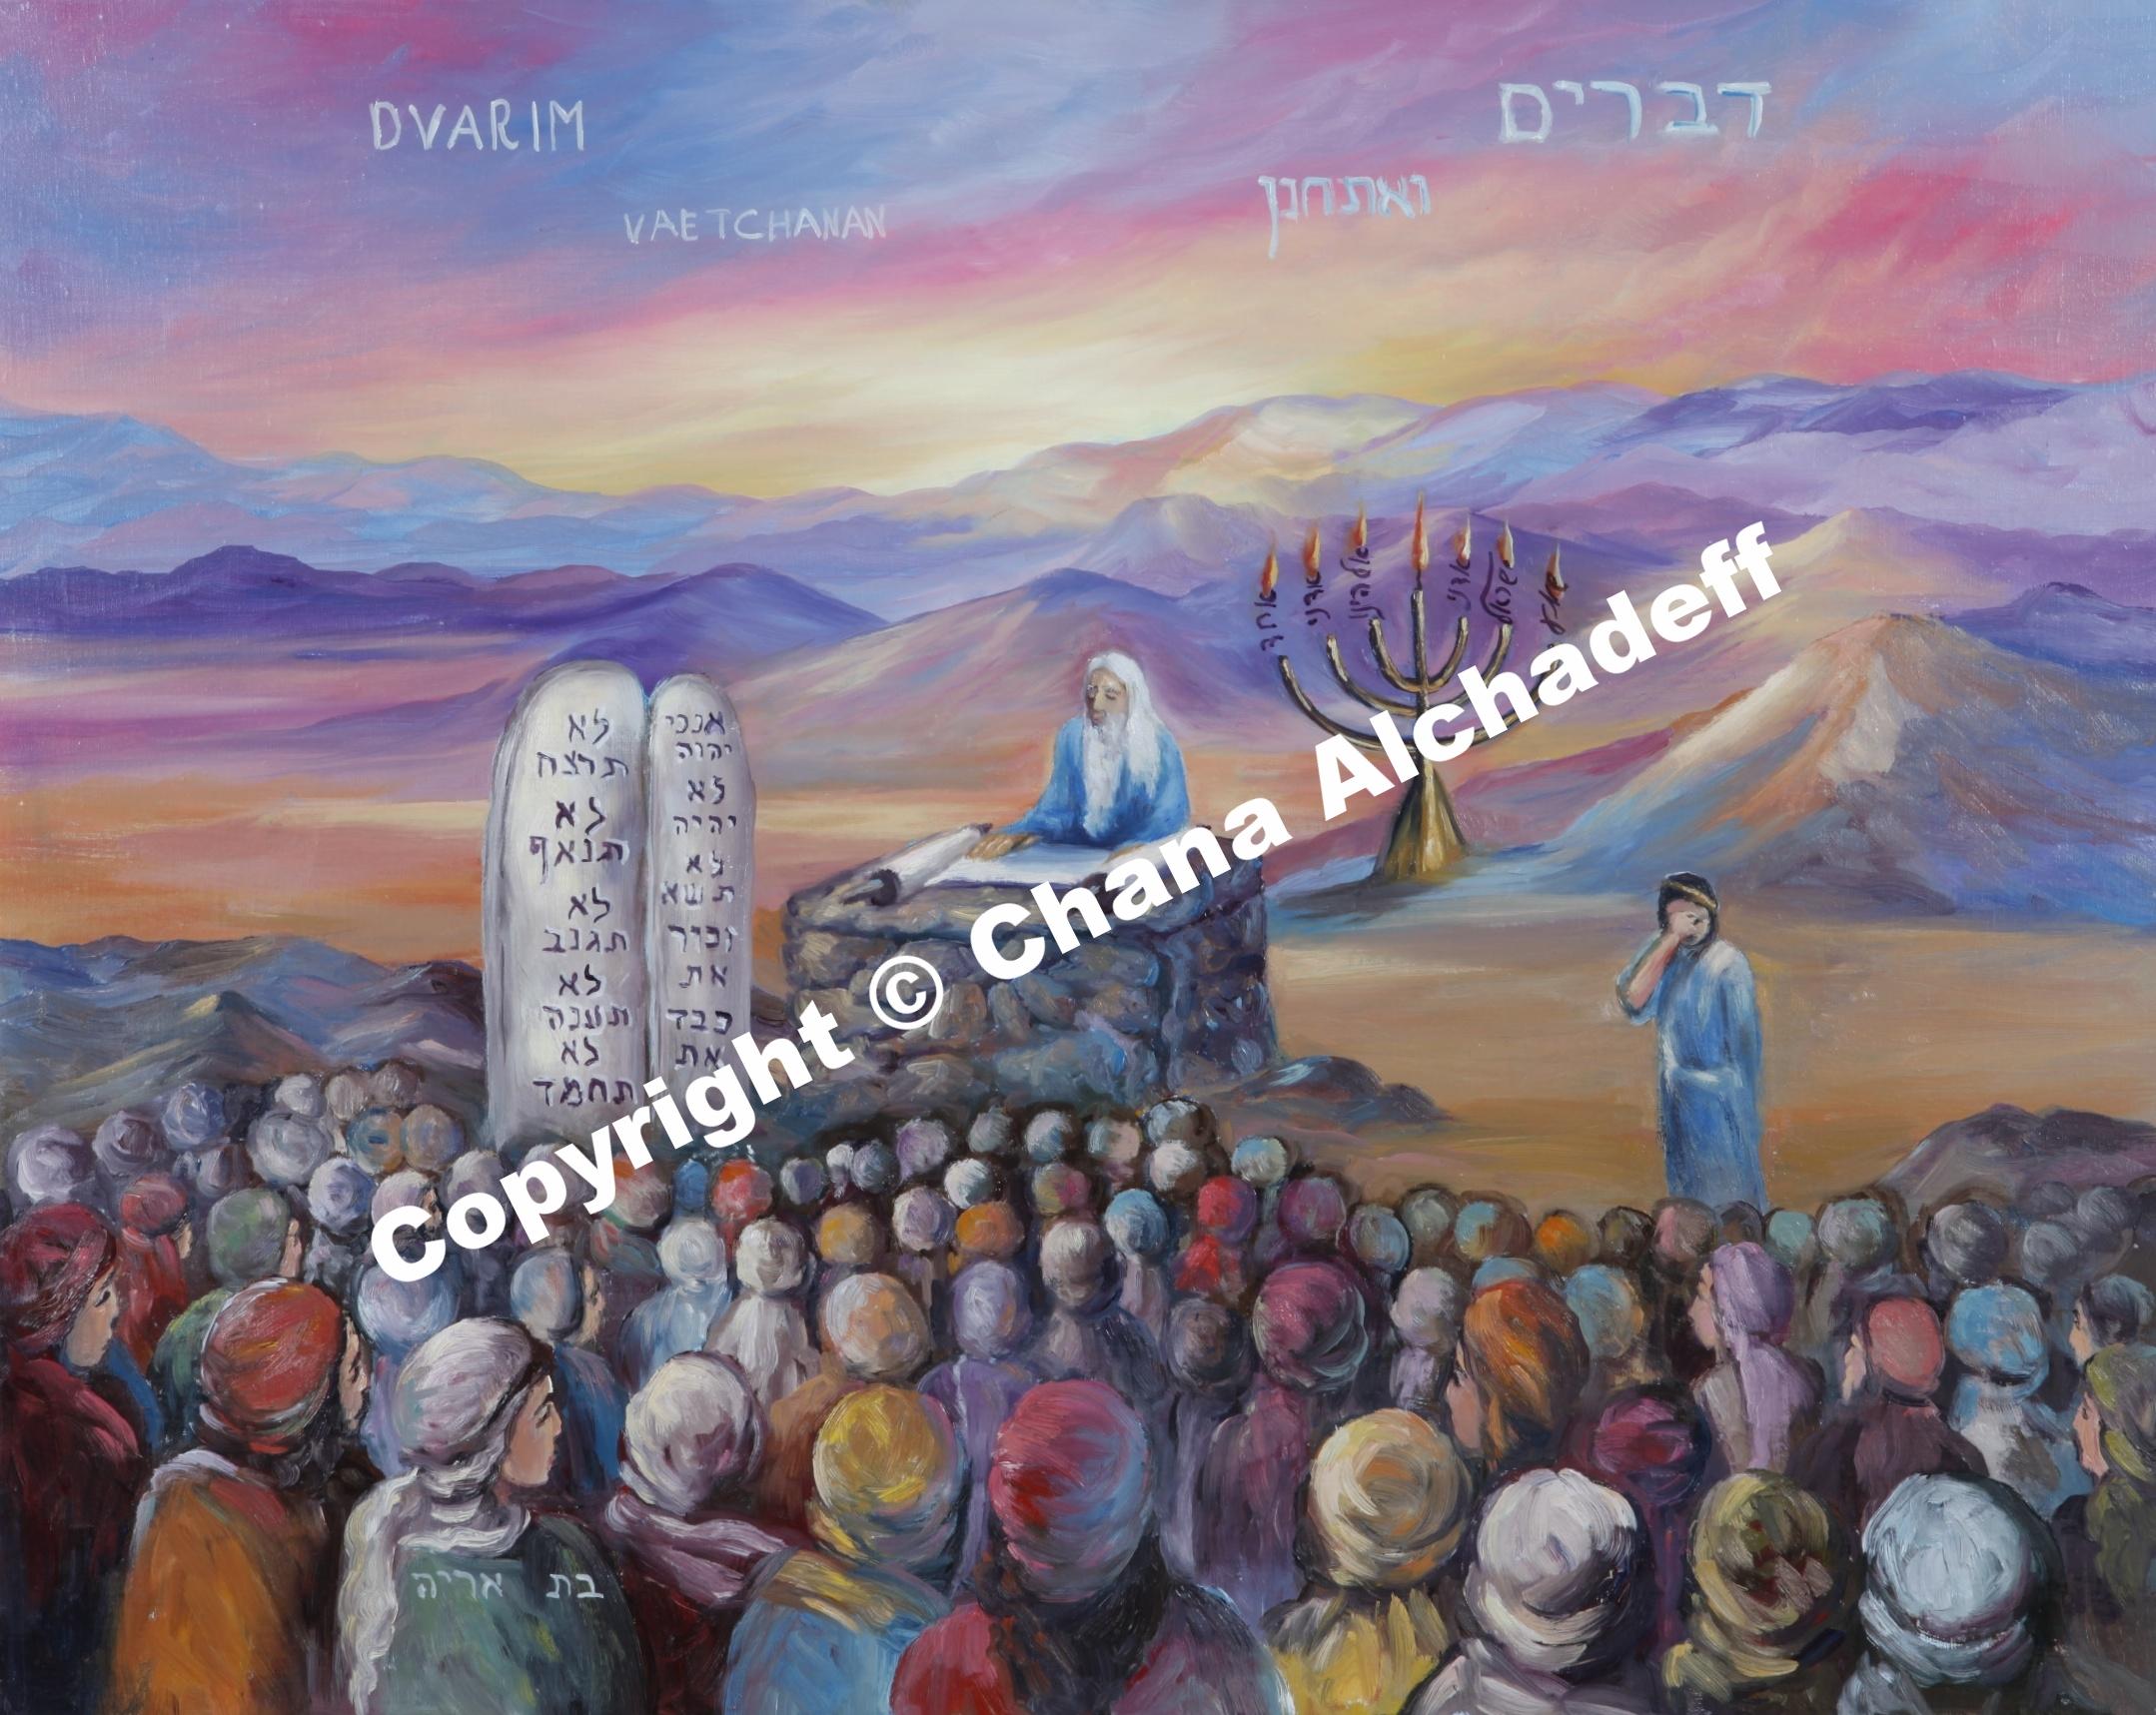 44-45 - Devarim-Va'etchanan